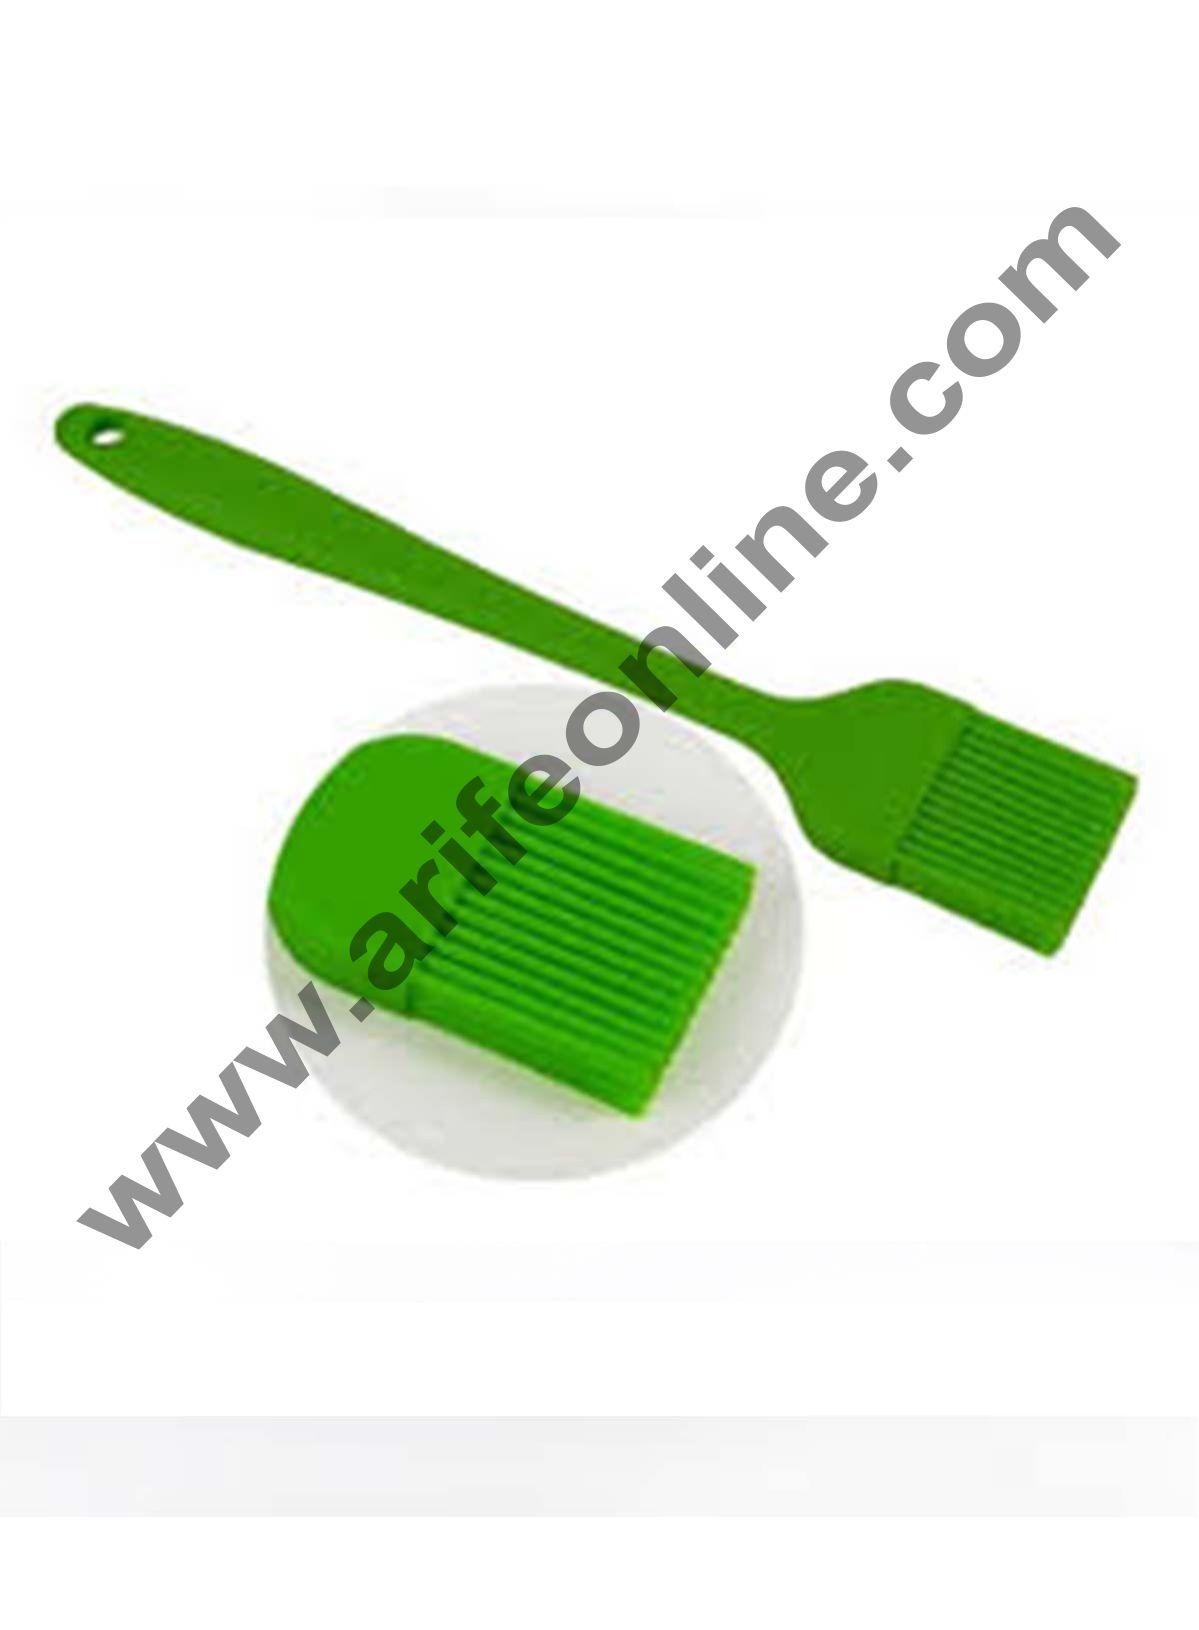 Cake Decor 1Pcs Silicone Medium Brush